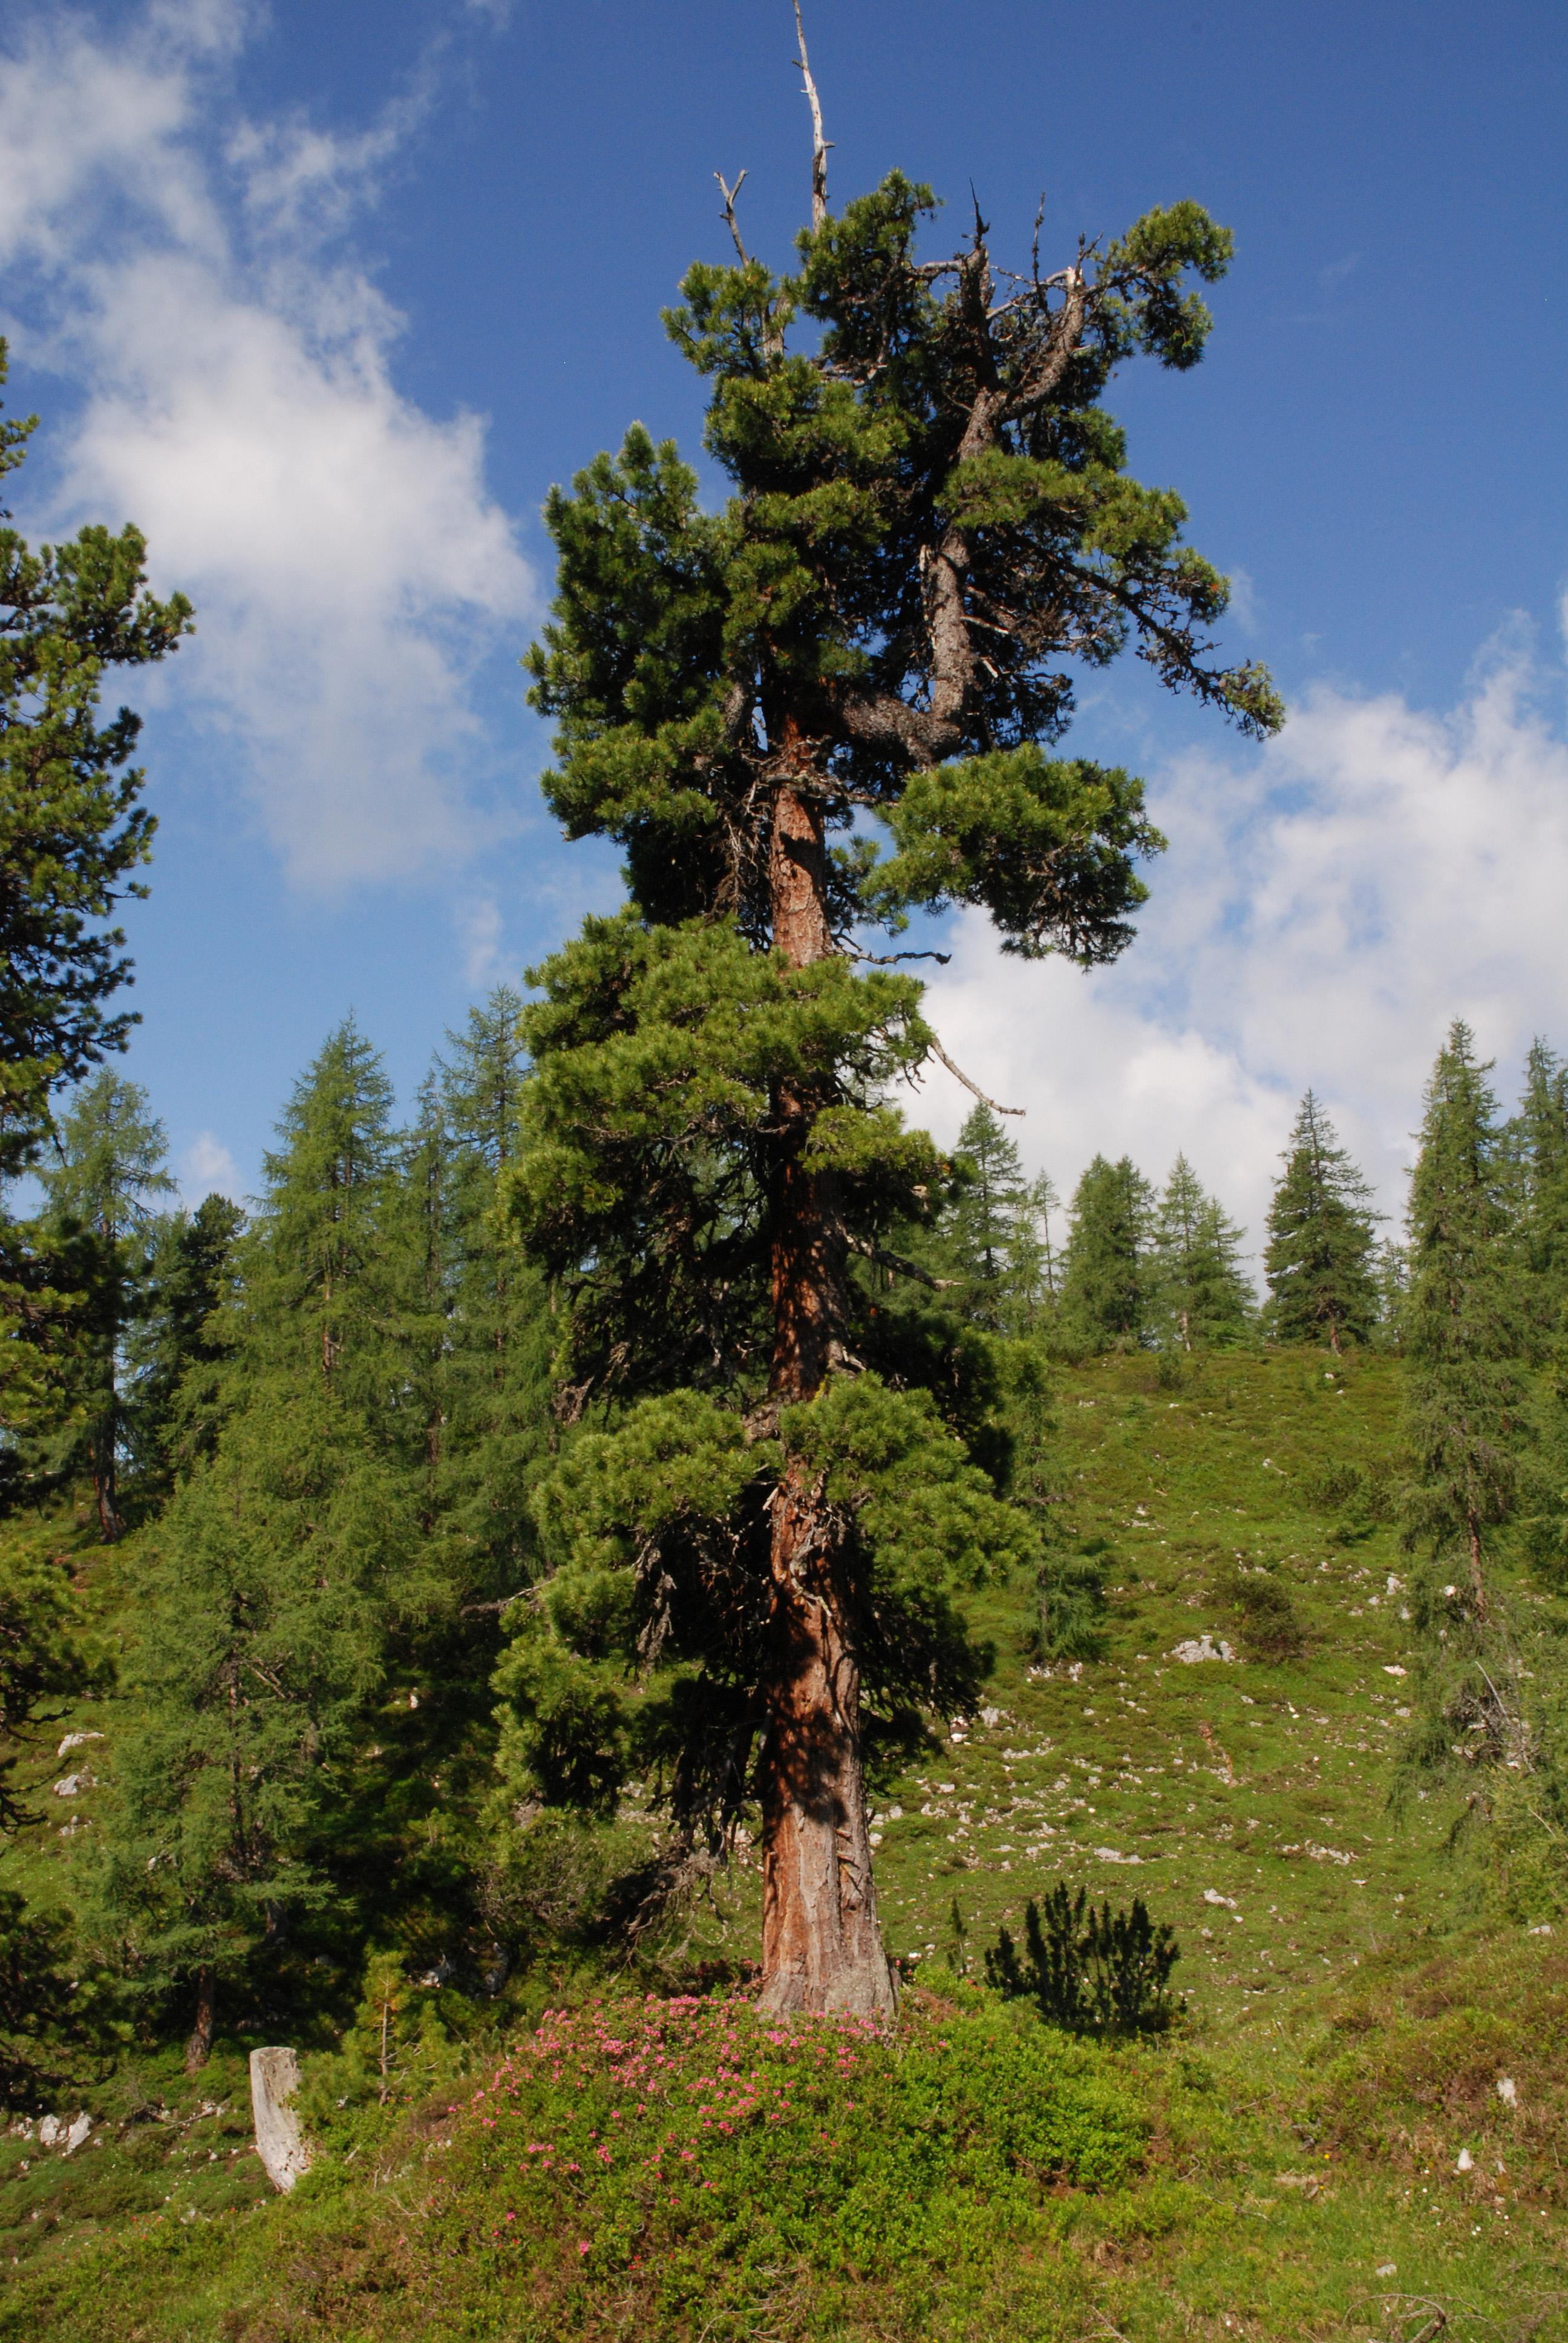 1 Stk Ötztal Pinus cembra Zirbelkiefer 8-10 cm